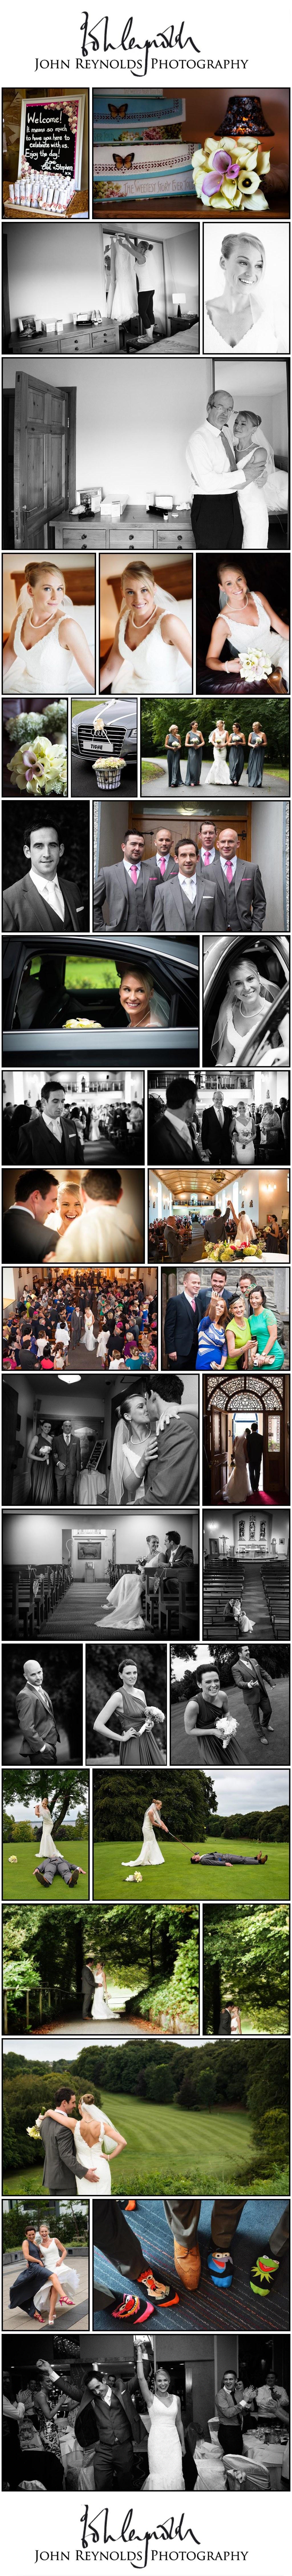 Blog Collage-Edel & Stephen1